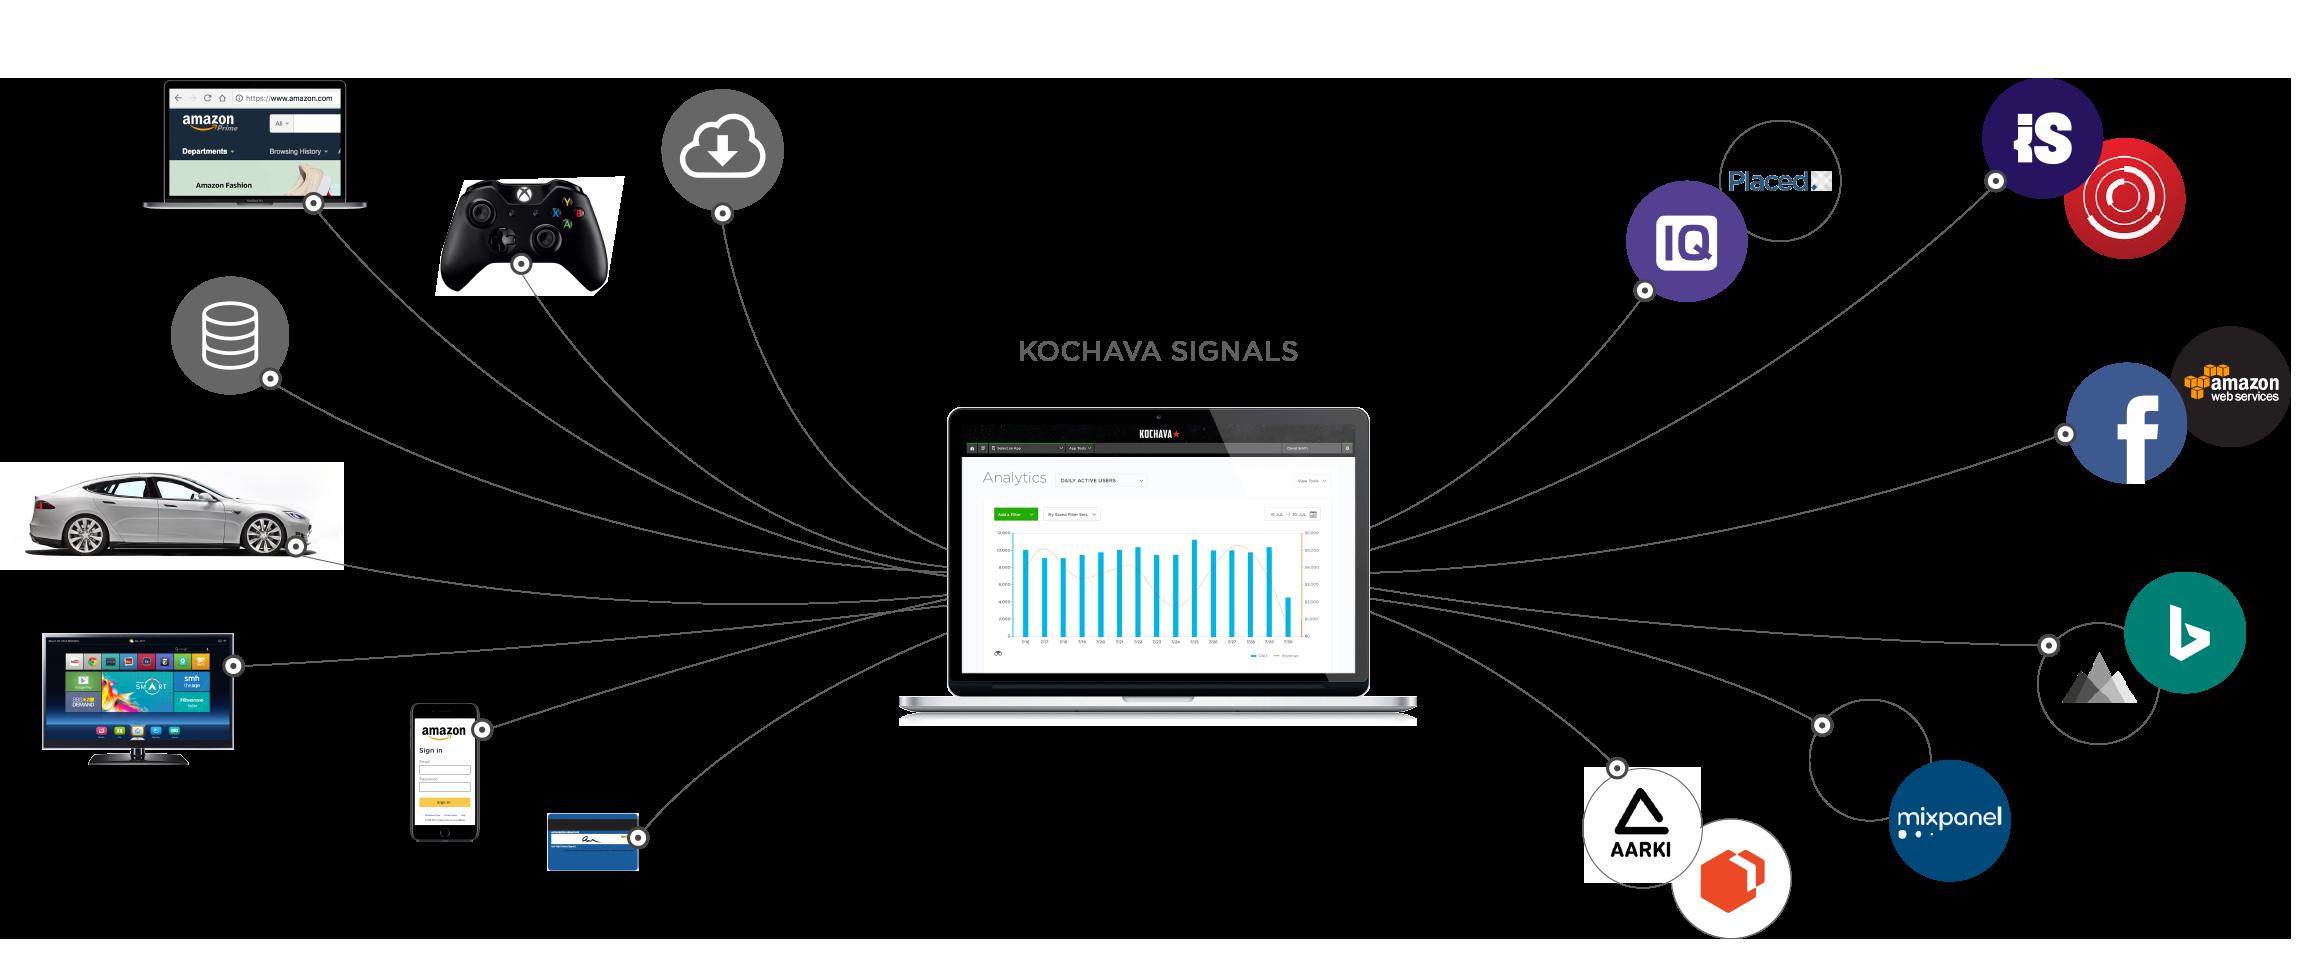 Measuring Kochava Signals with the Kochava Analytics Dashboard